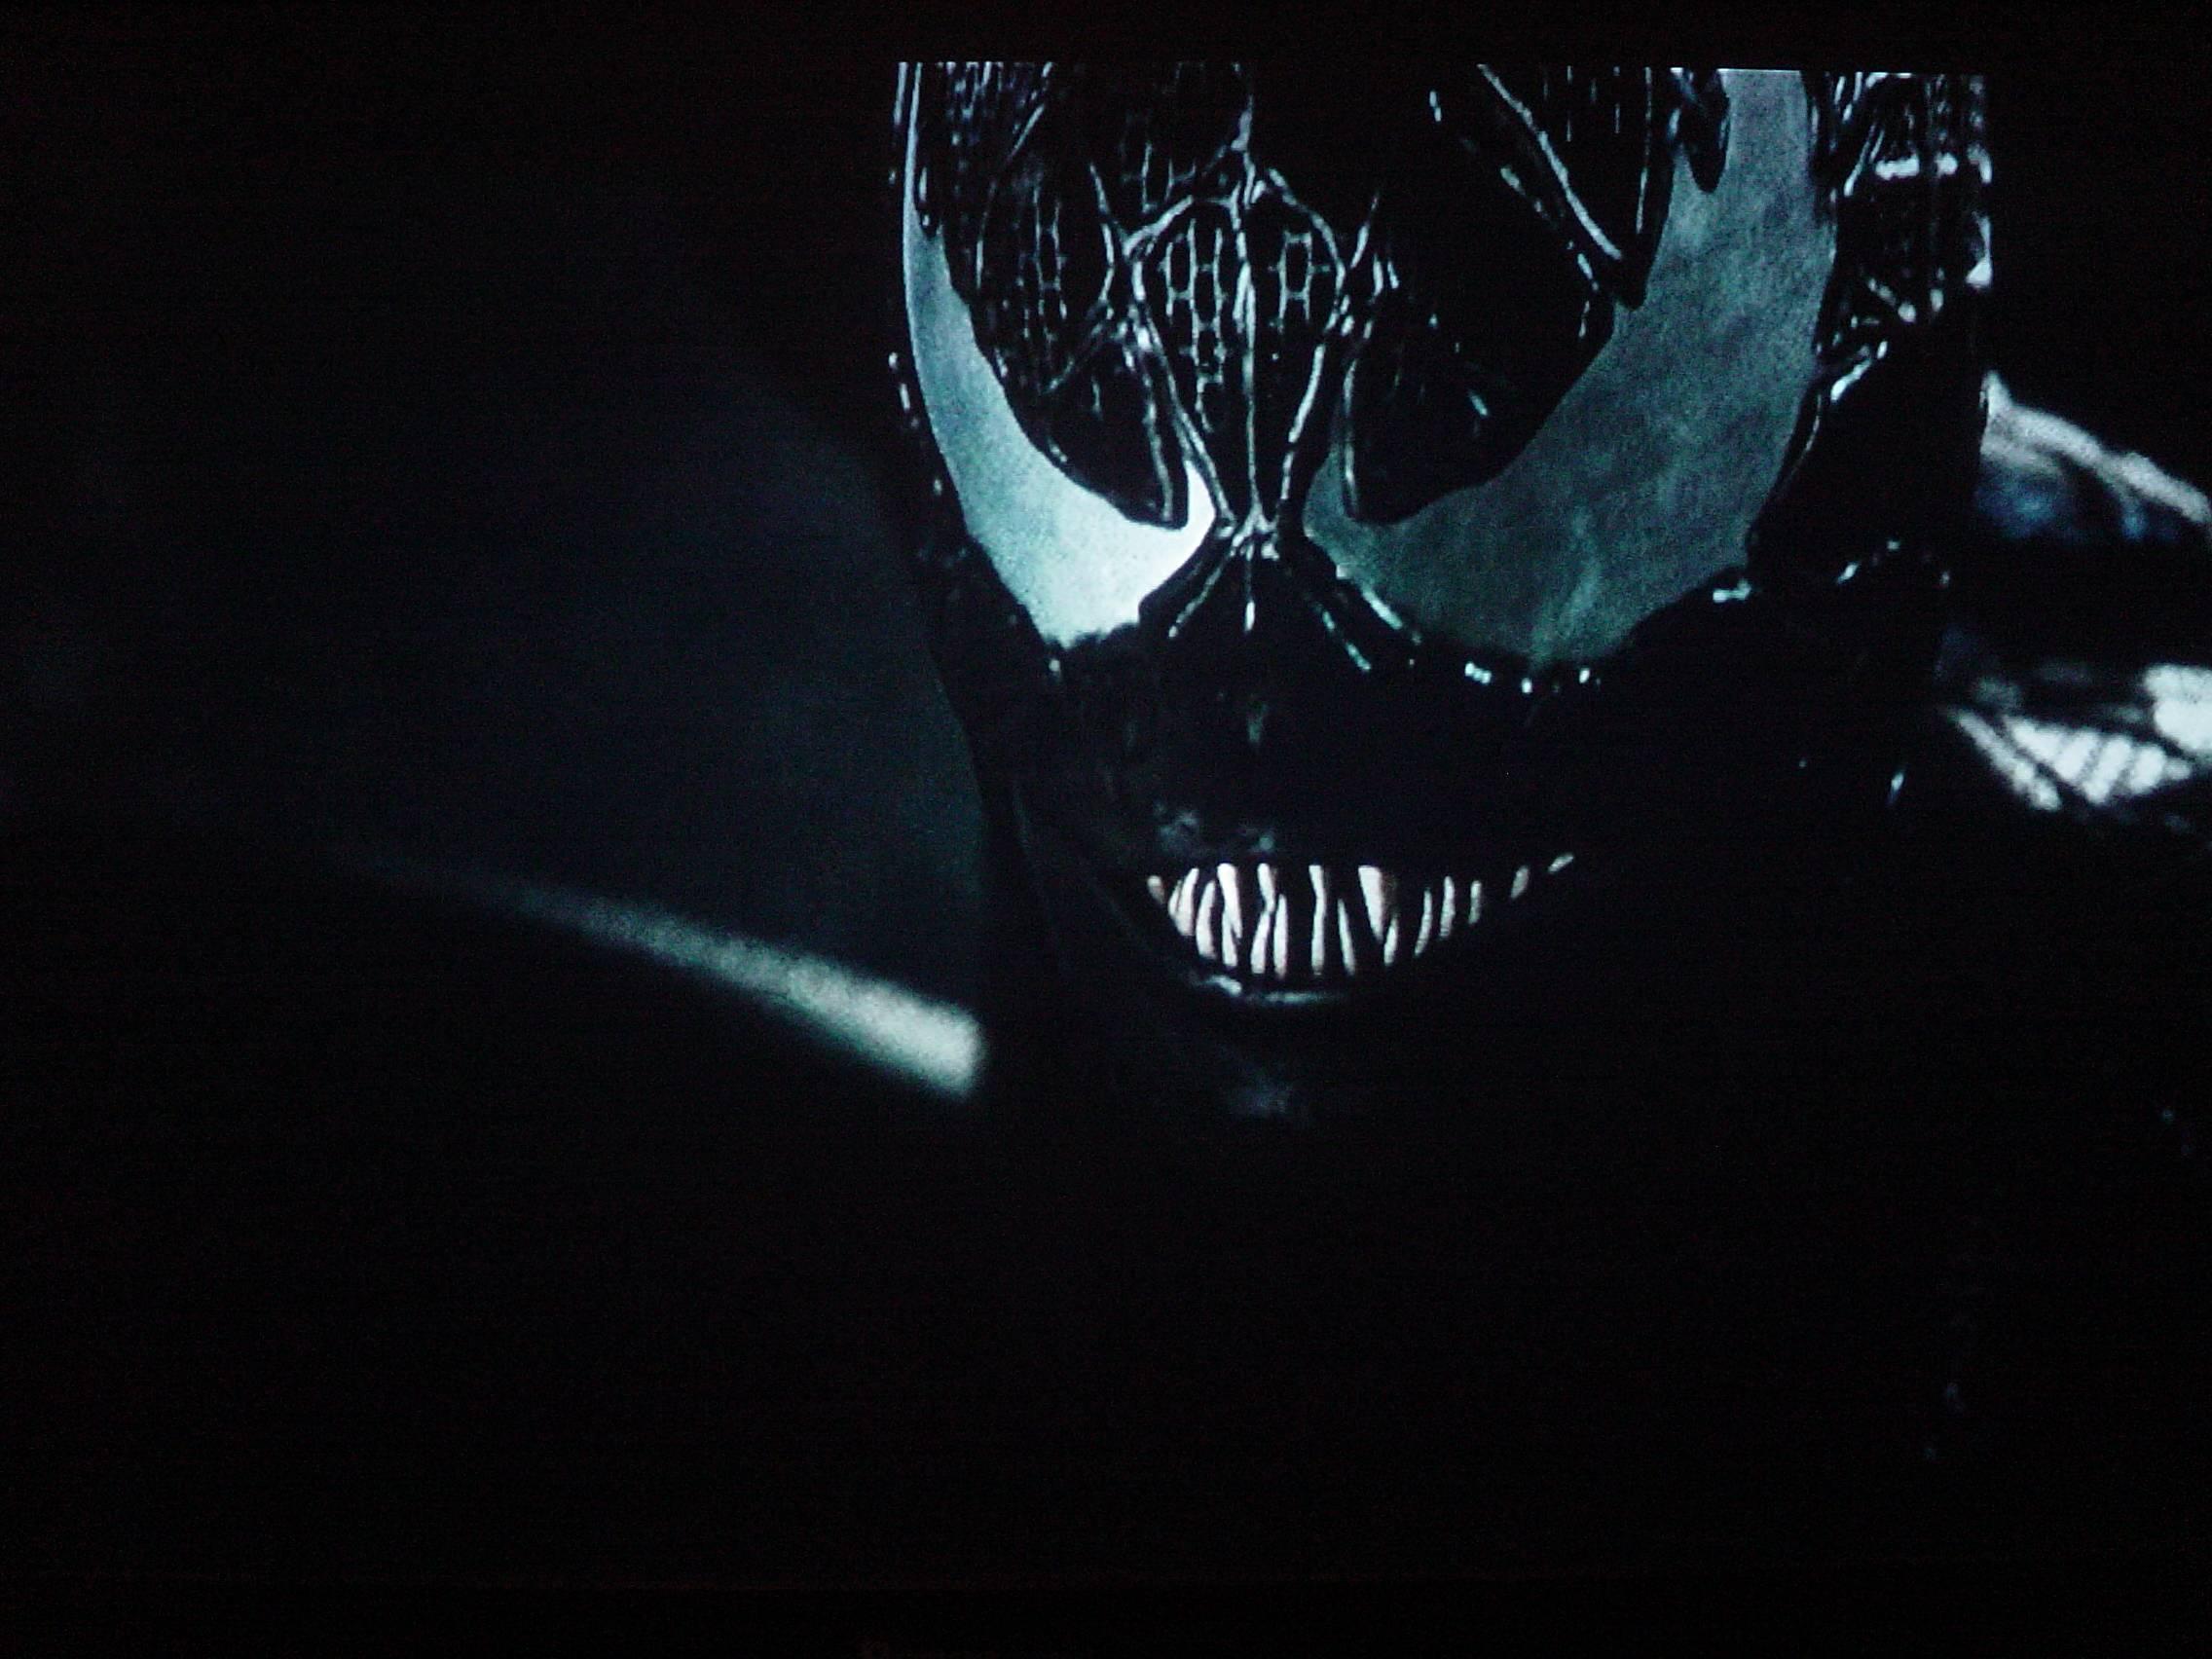 Spiderman Venom Wallpapers 2272x1704